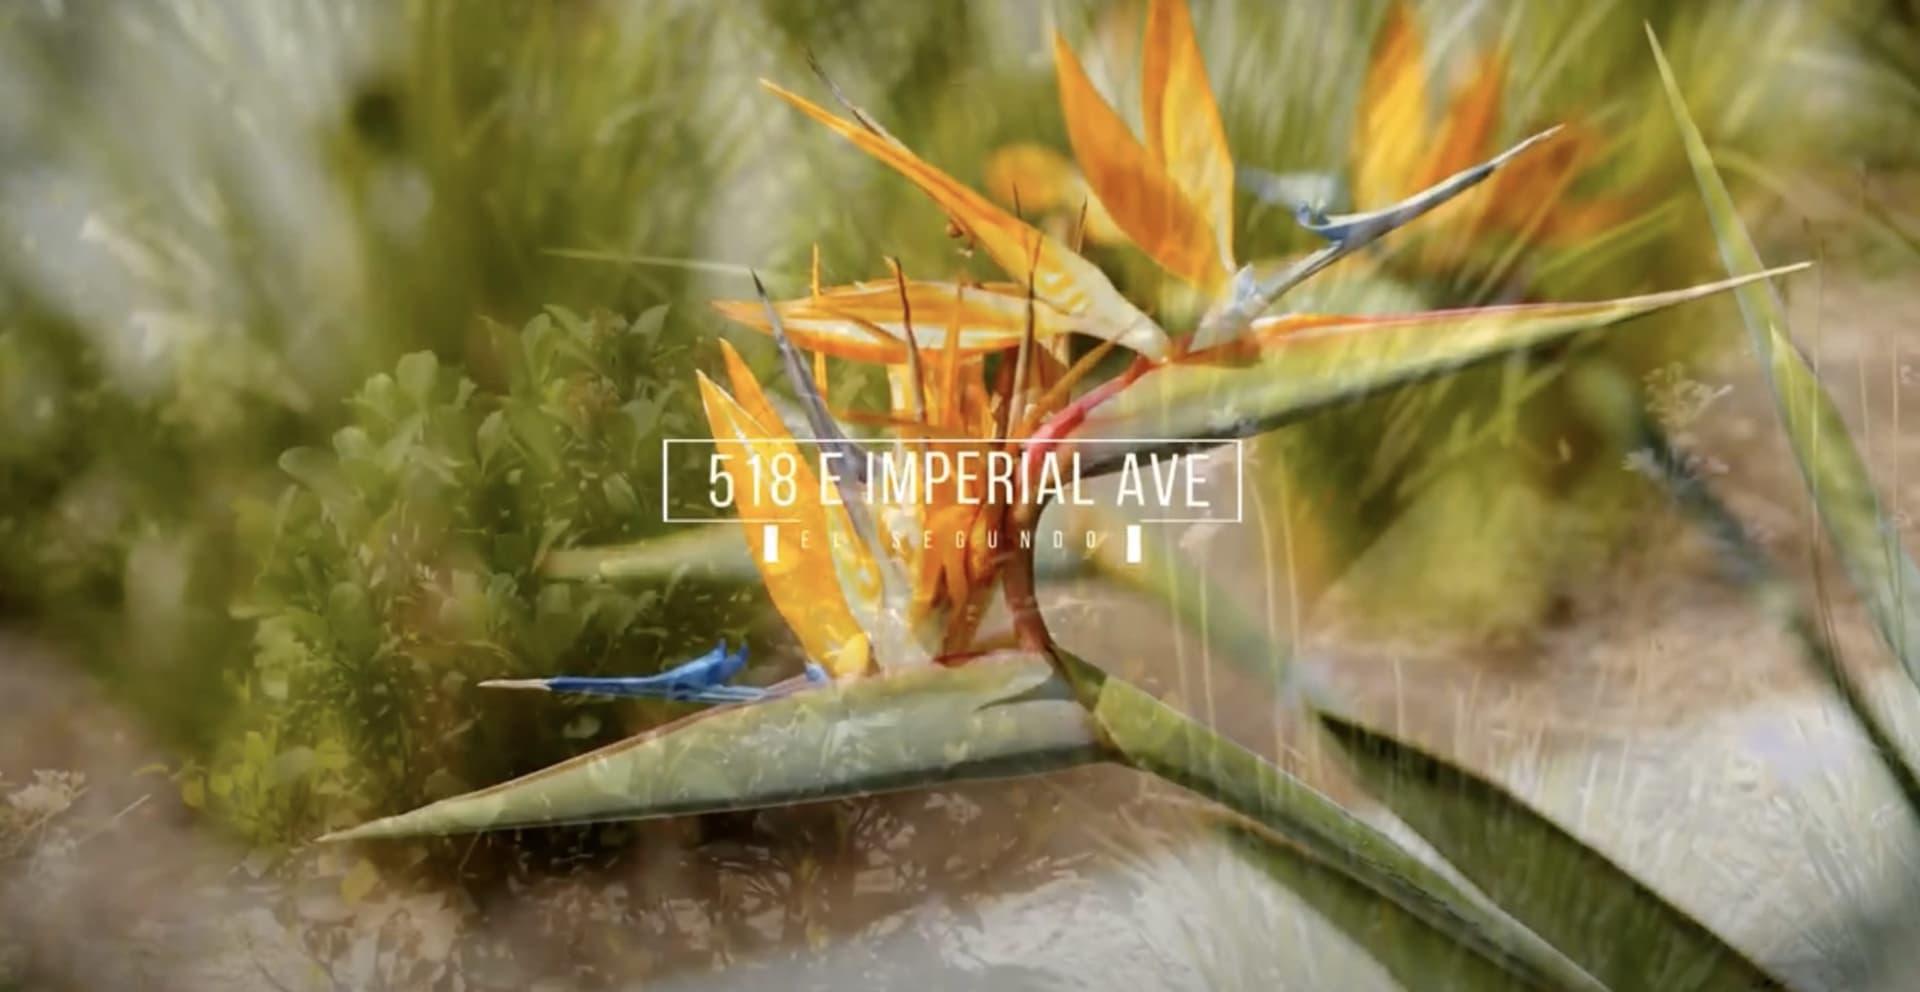 518 E Imperial | El Segundo video preview